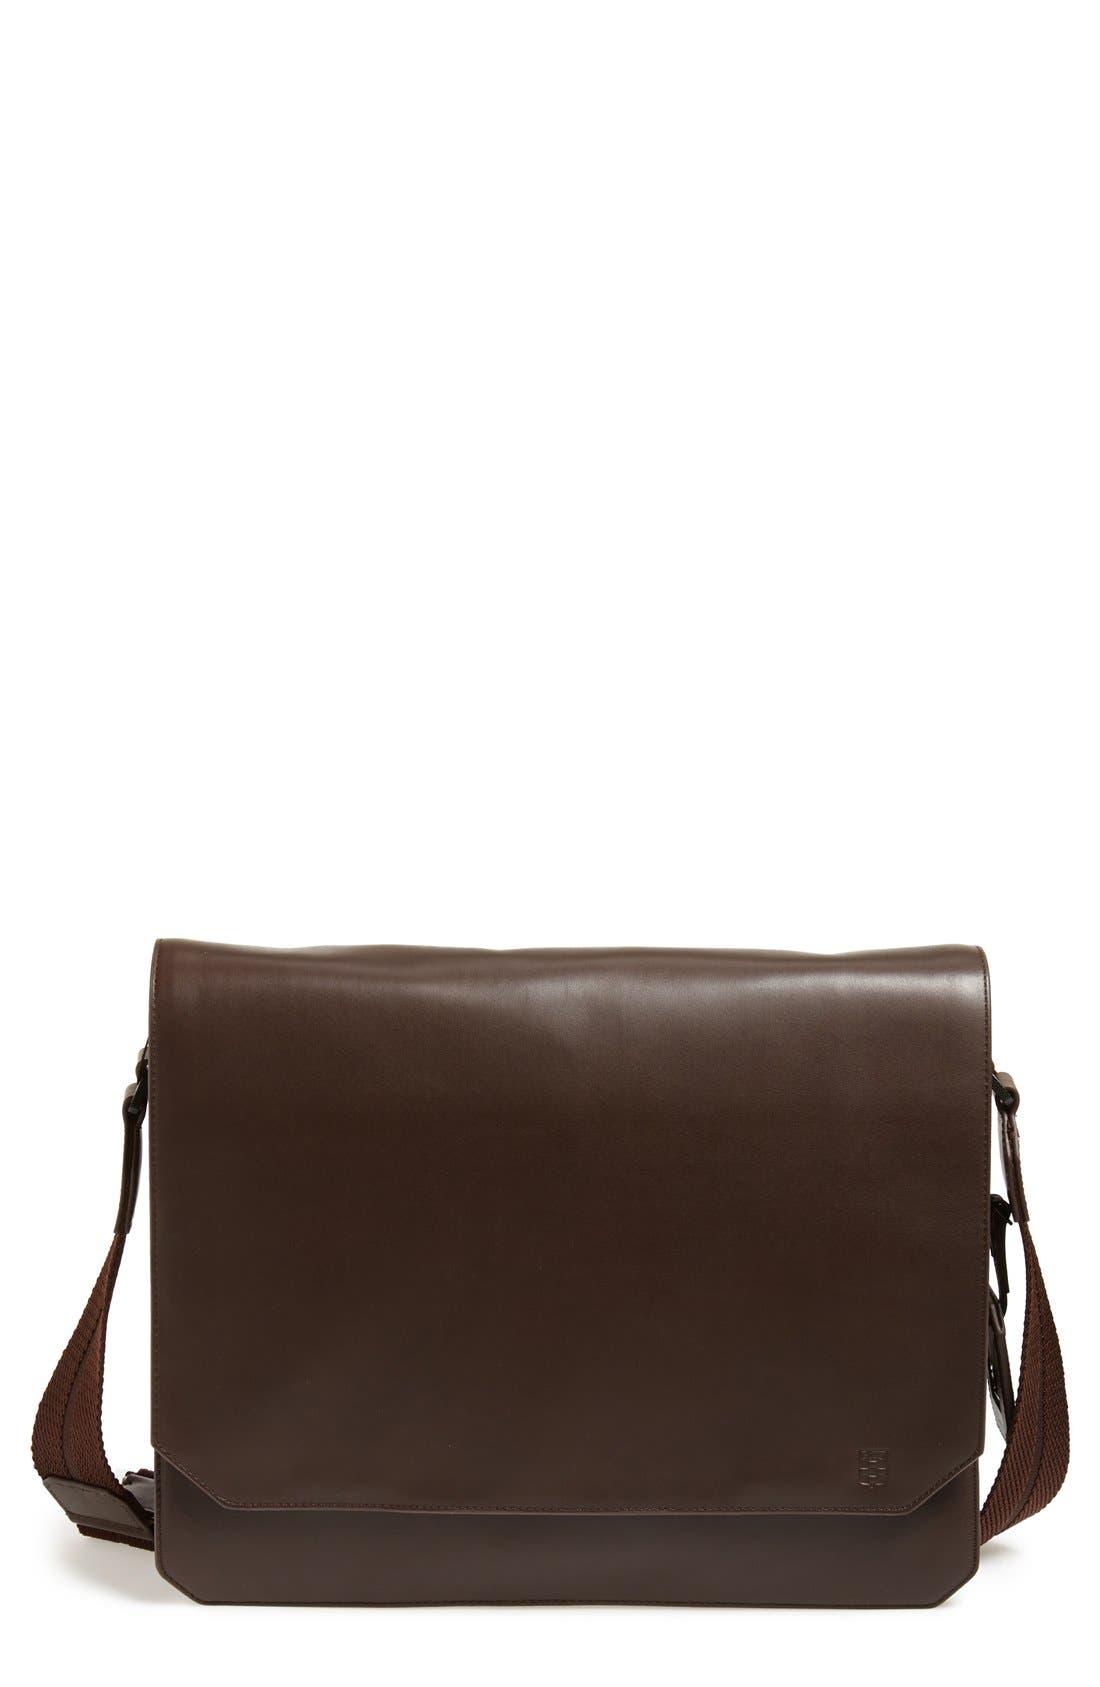 'Tolve' Leather Messenger Bag,                             Main thumbnail 1, color,                             210